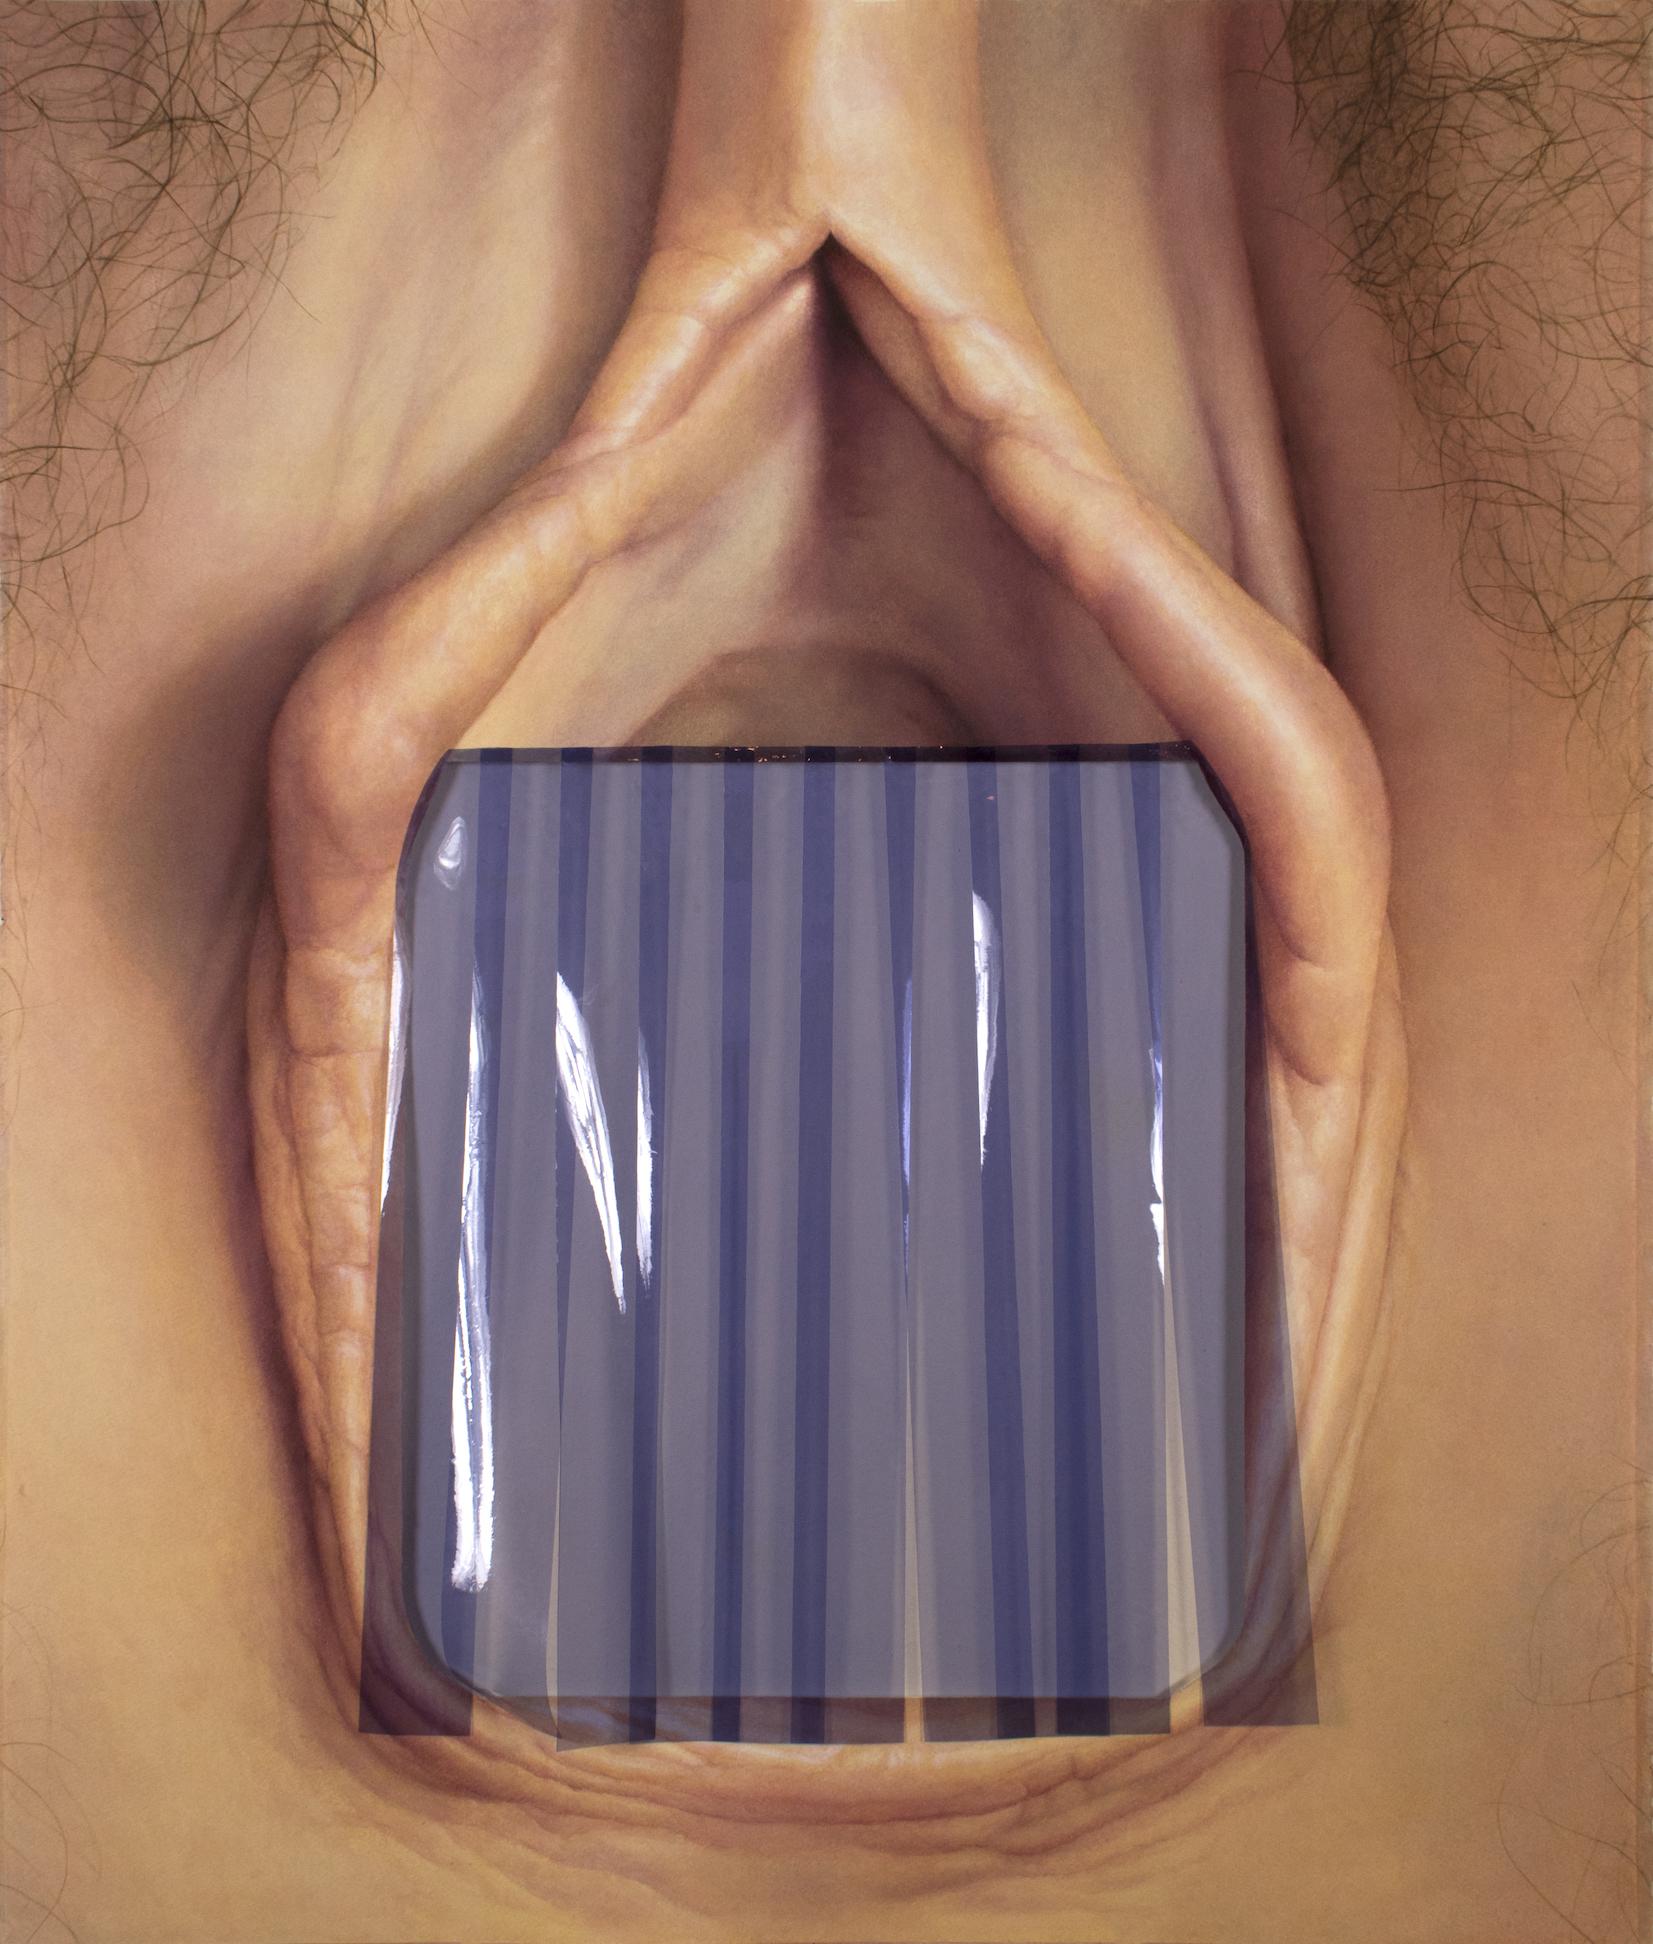 {strip door, vagina}, watercolor and plastic on paper, 2018